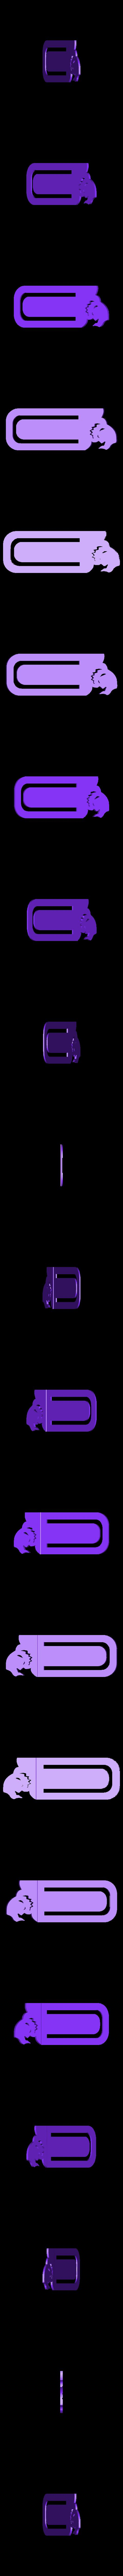 oggie.stl Télécharger fichier STL gratuit Oogie Boogie Bookmark • Objet imprimable en 3D, ScrapPrinting